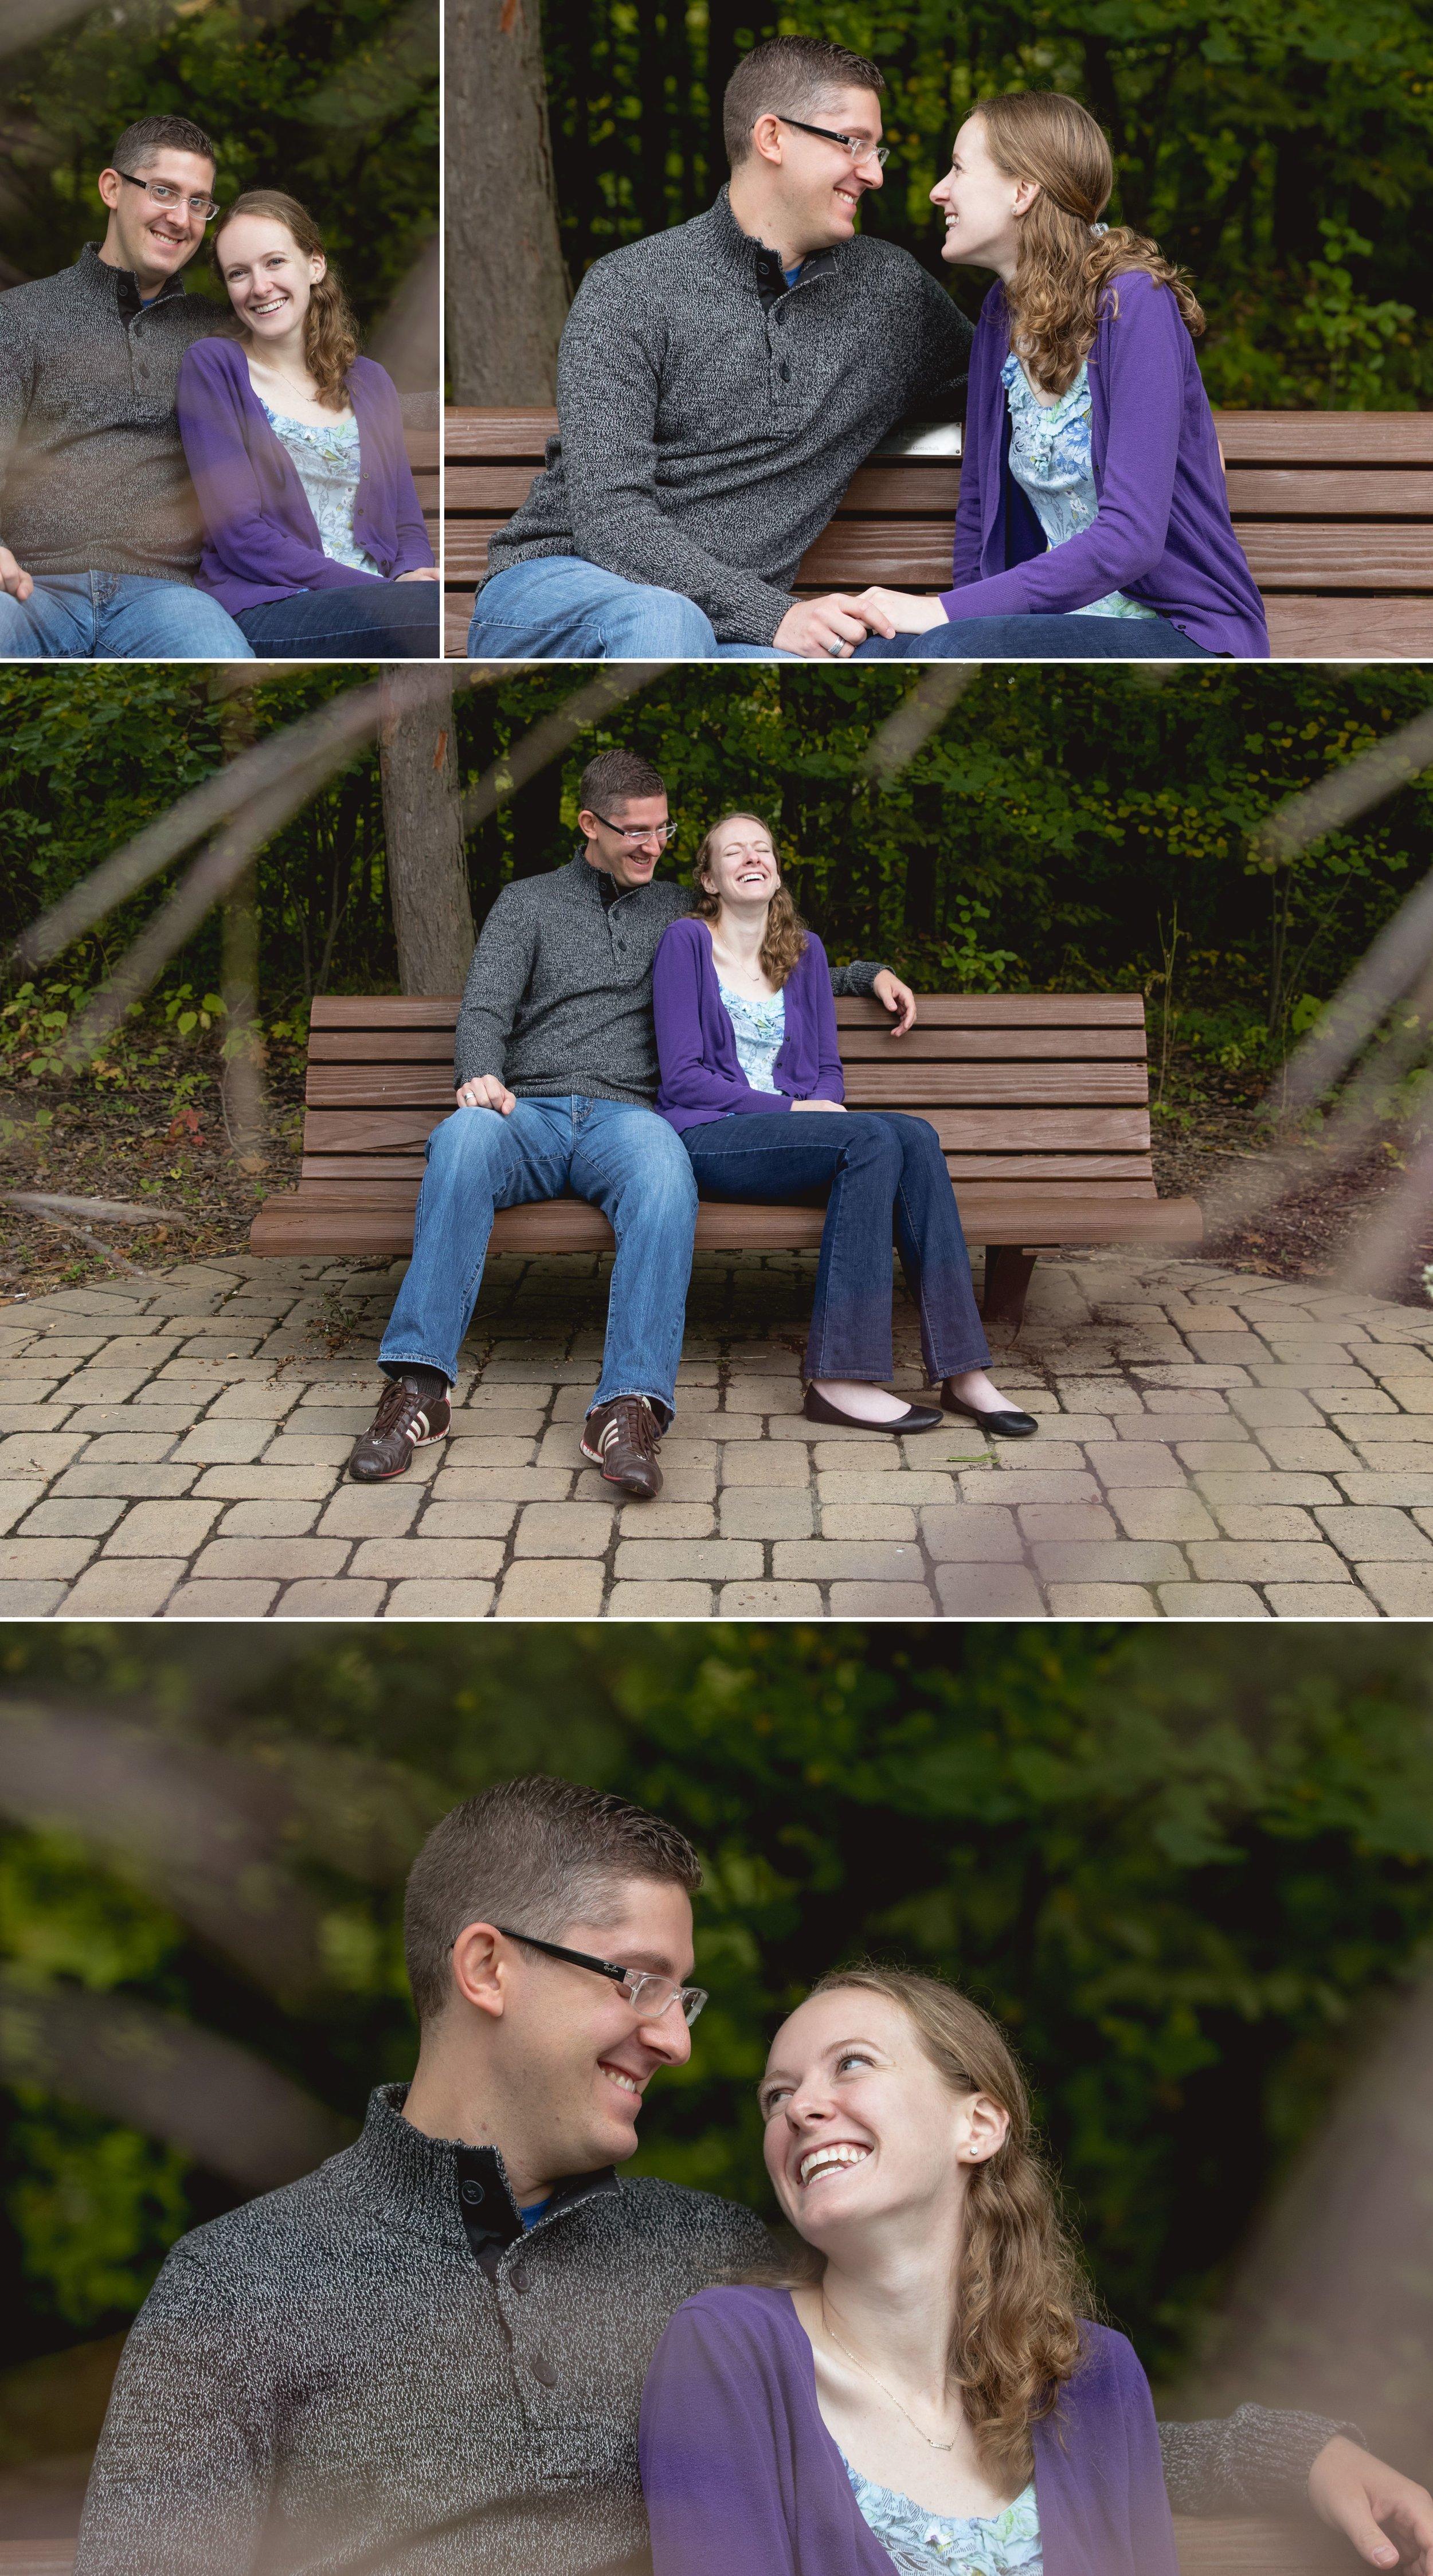 highbanks-metro-park-lewis-center-engagement-portraits-gahanna-columbus-photographer-studio-001.JPG